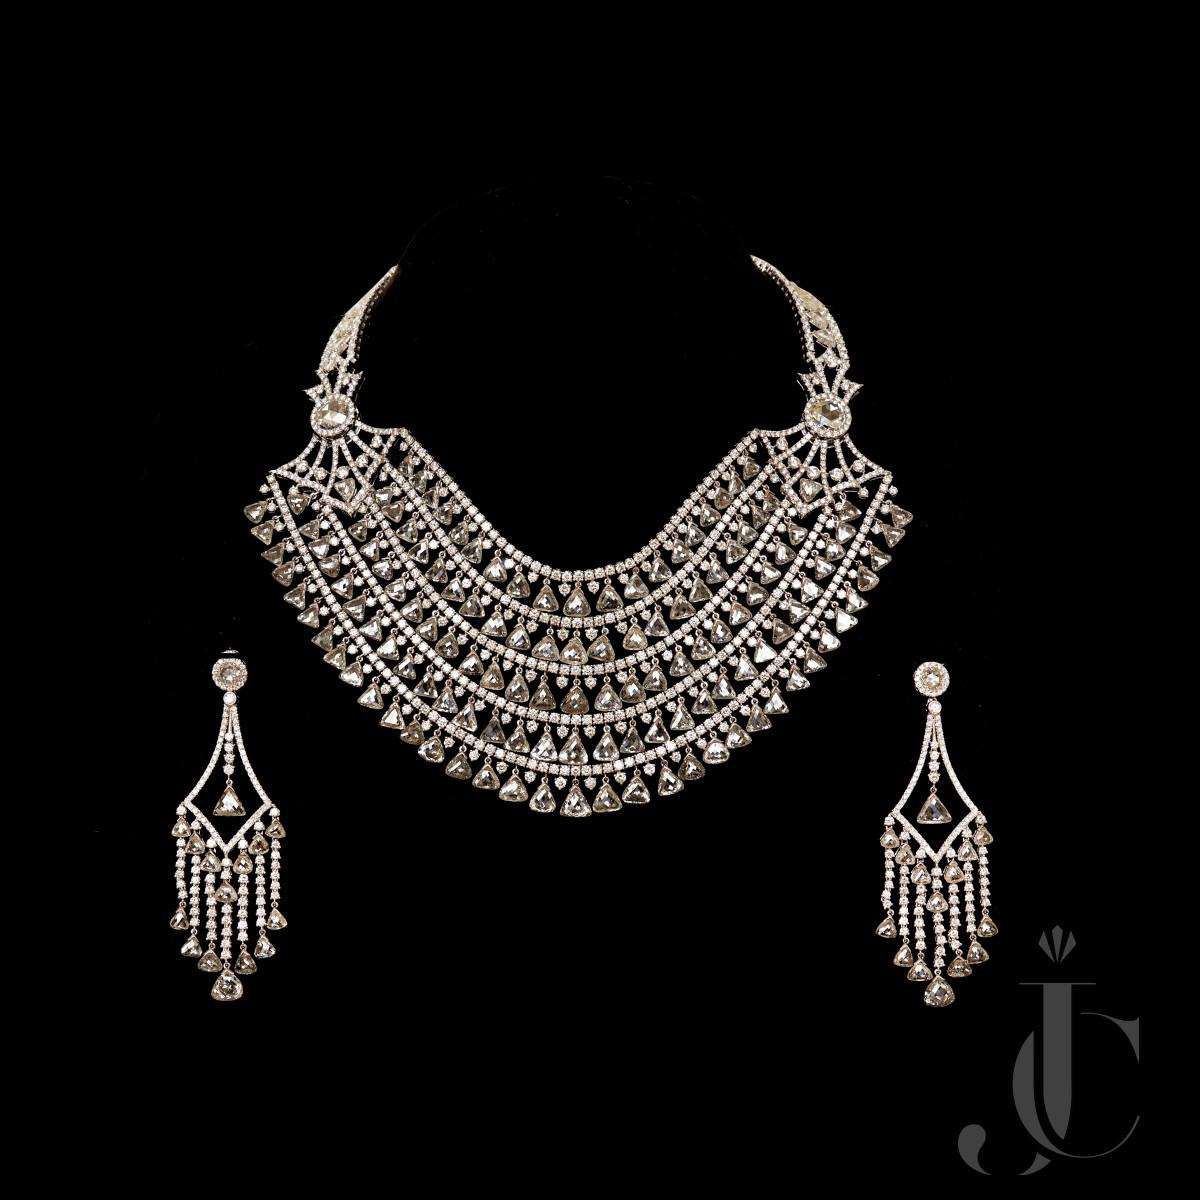 A Very Unique Extra Fine White Diamond Triangle (Tavij) Necklace & Earing